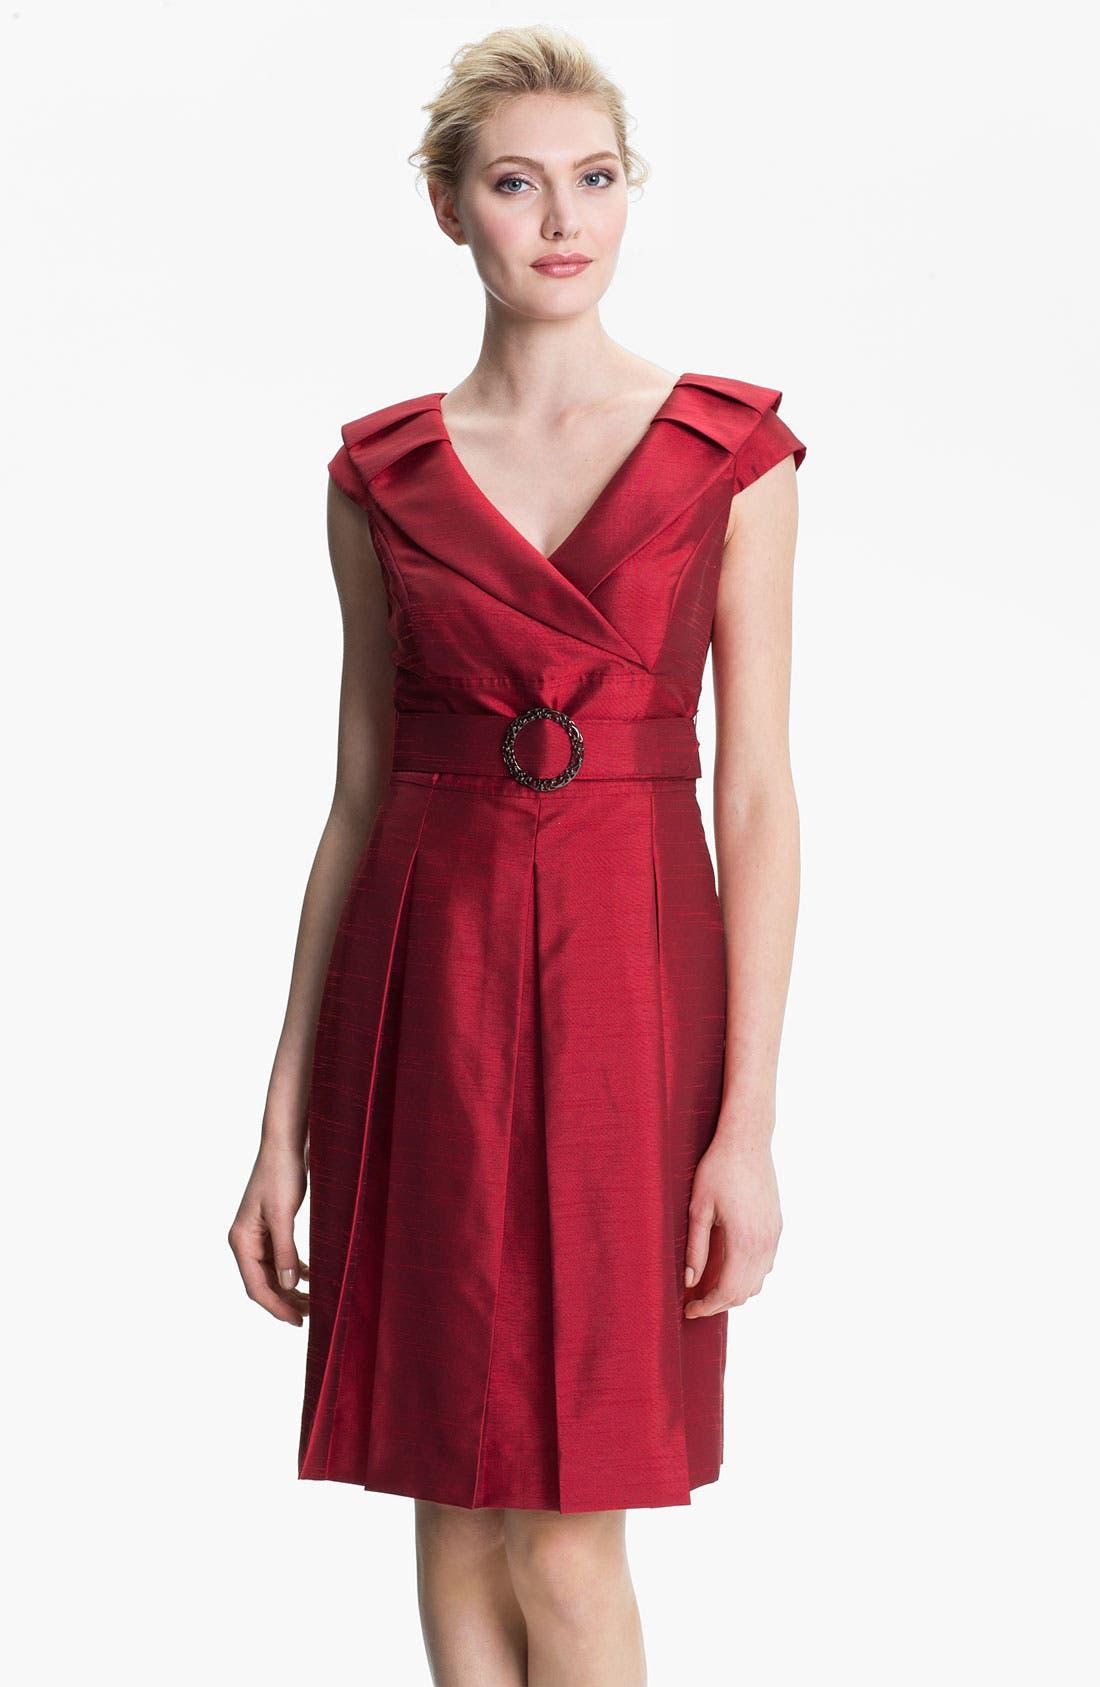 Alternate Image 1 Selected - Tahari Belted Portrait Collar Fit & Flare Dress (Petite)